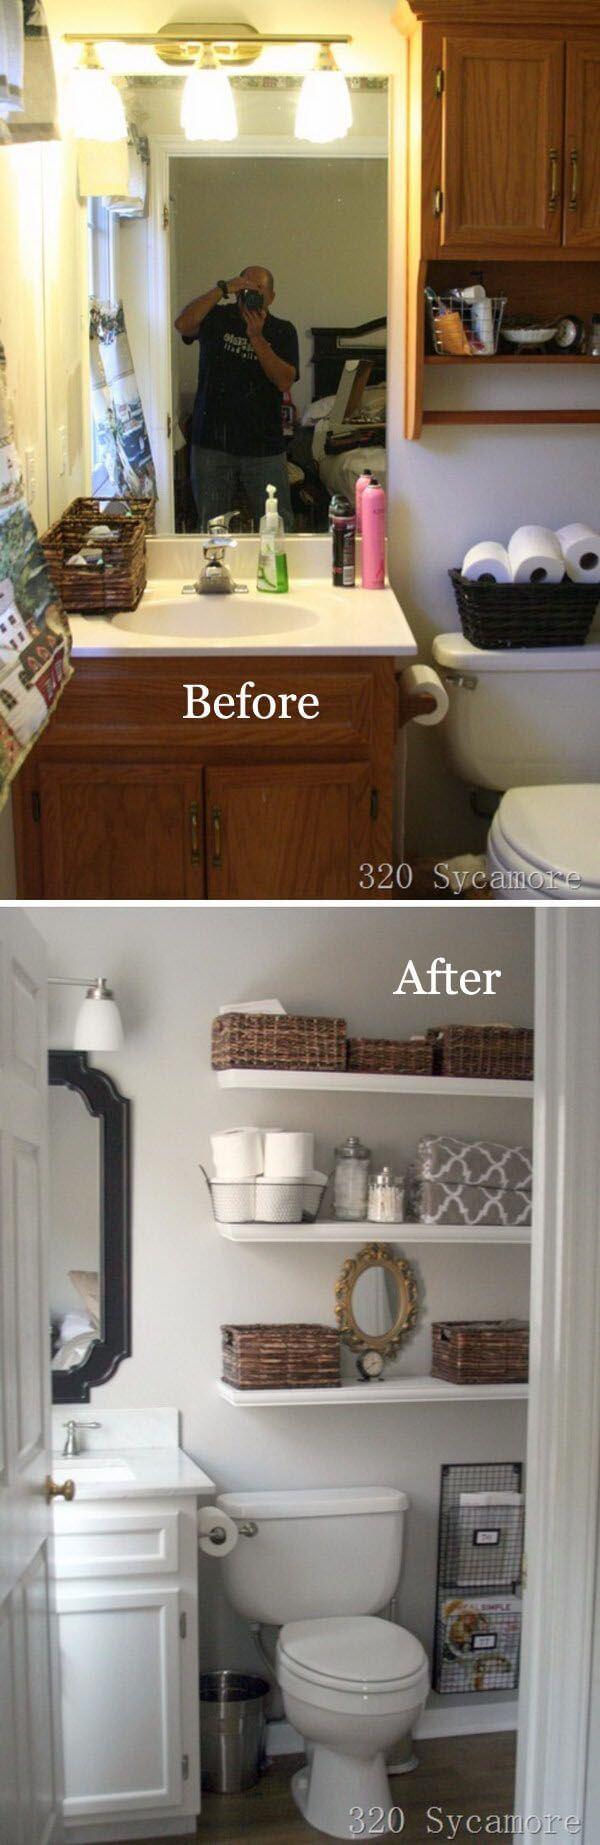 Fullsize Of Bathroom Shelf Decorations